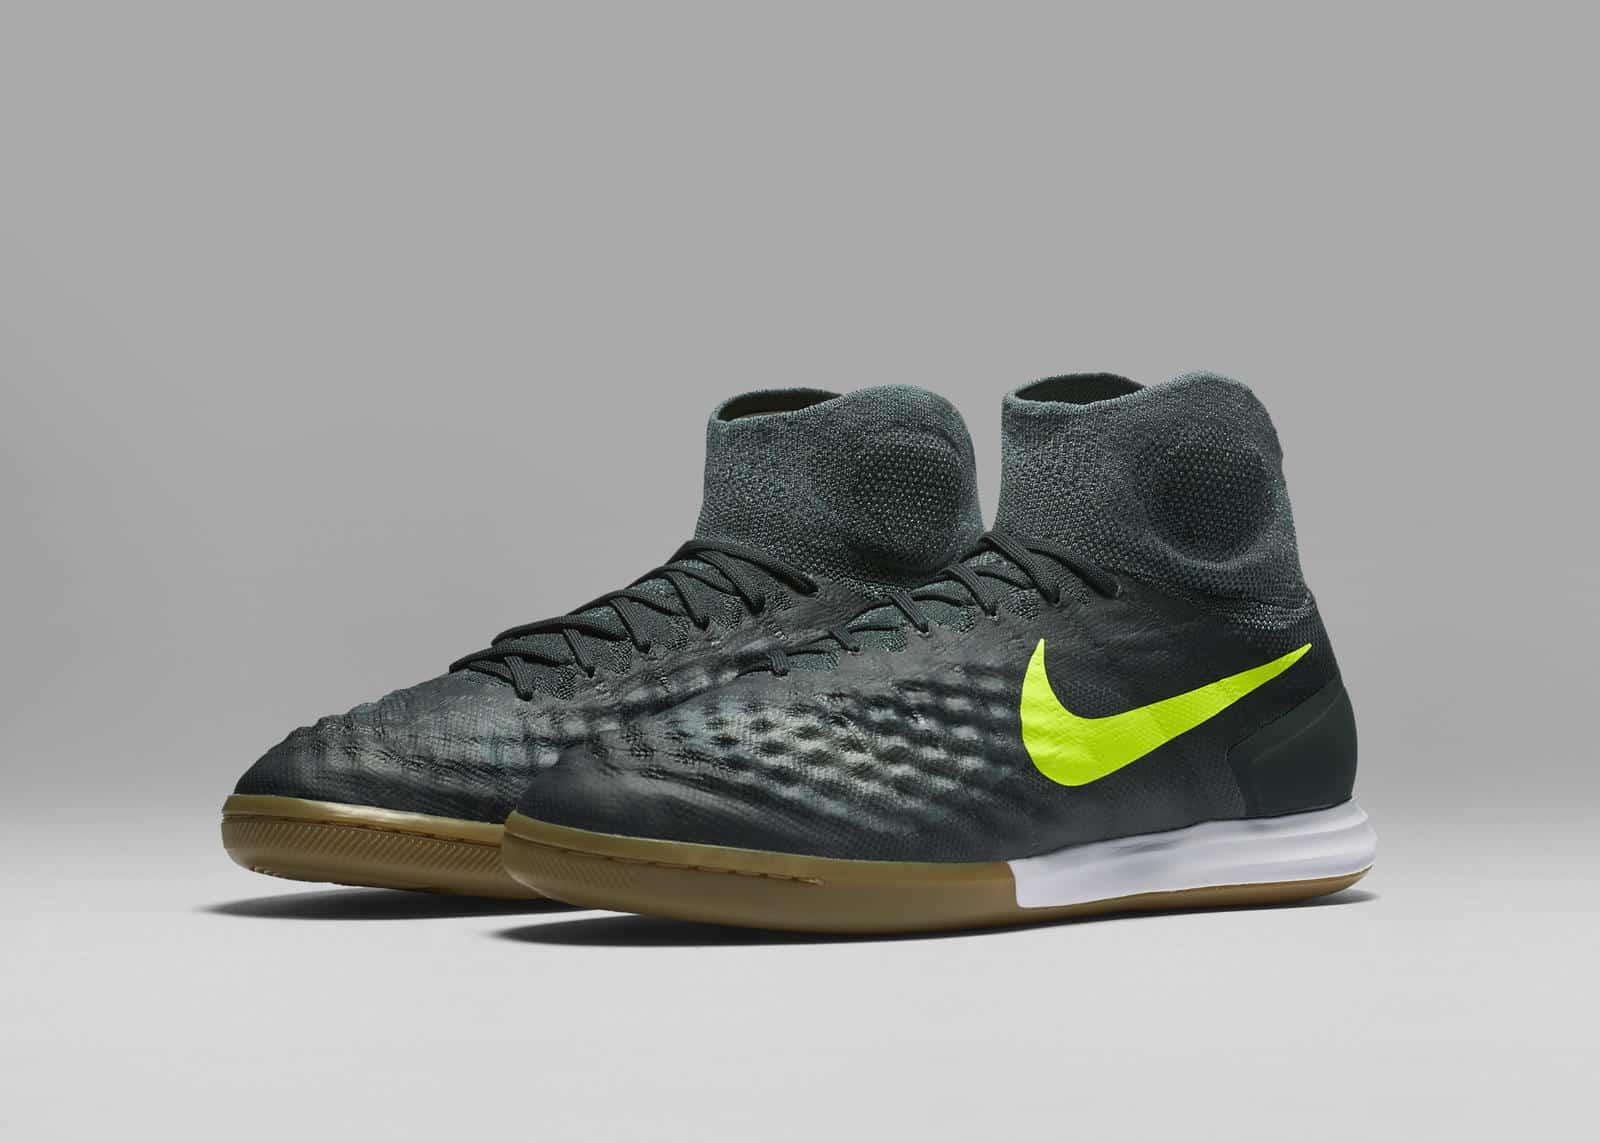 chaussure-football-nike-magistax-futsal-pack-floodlights-2016-3